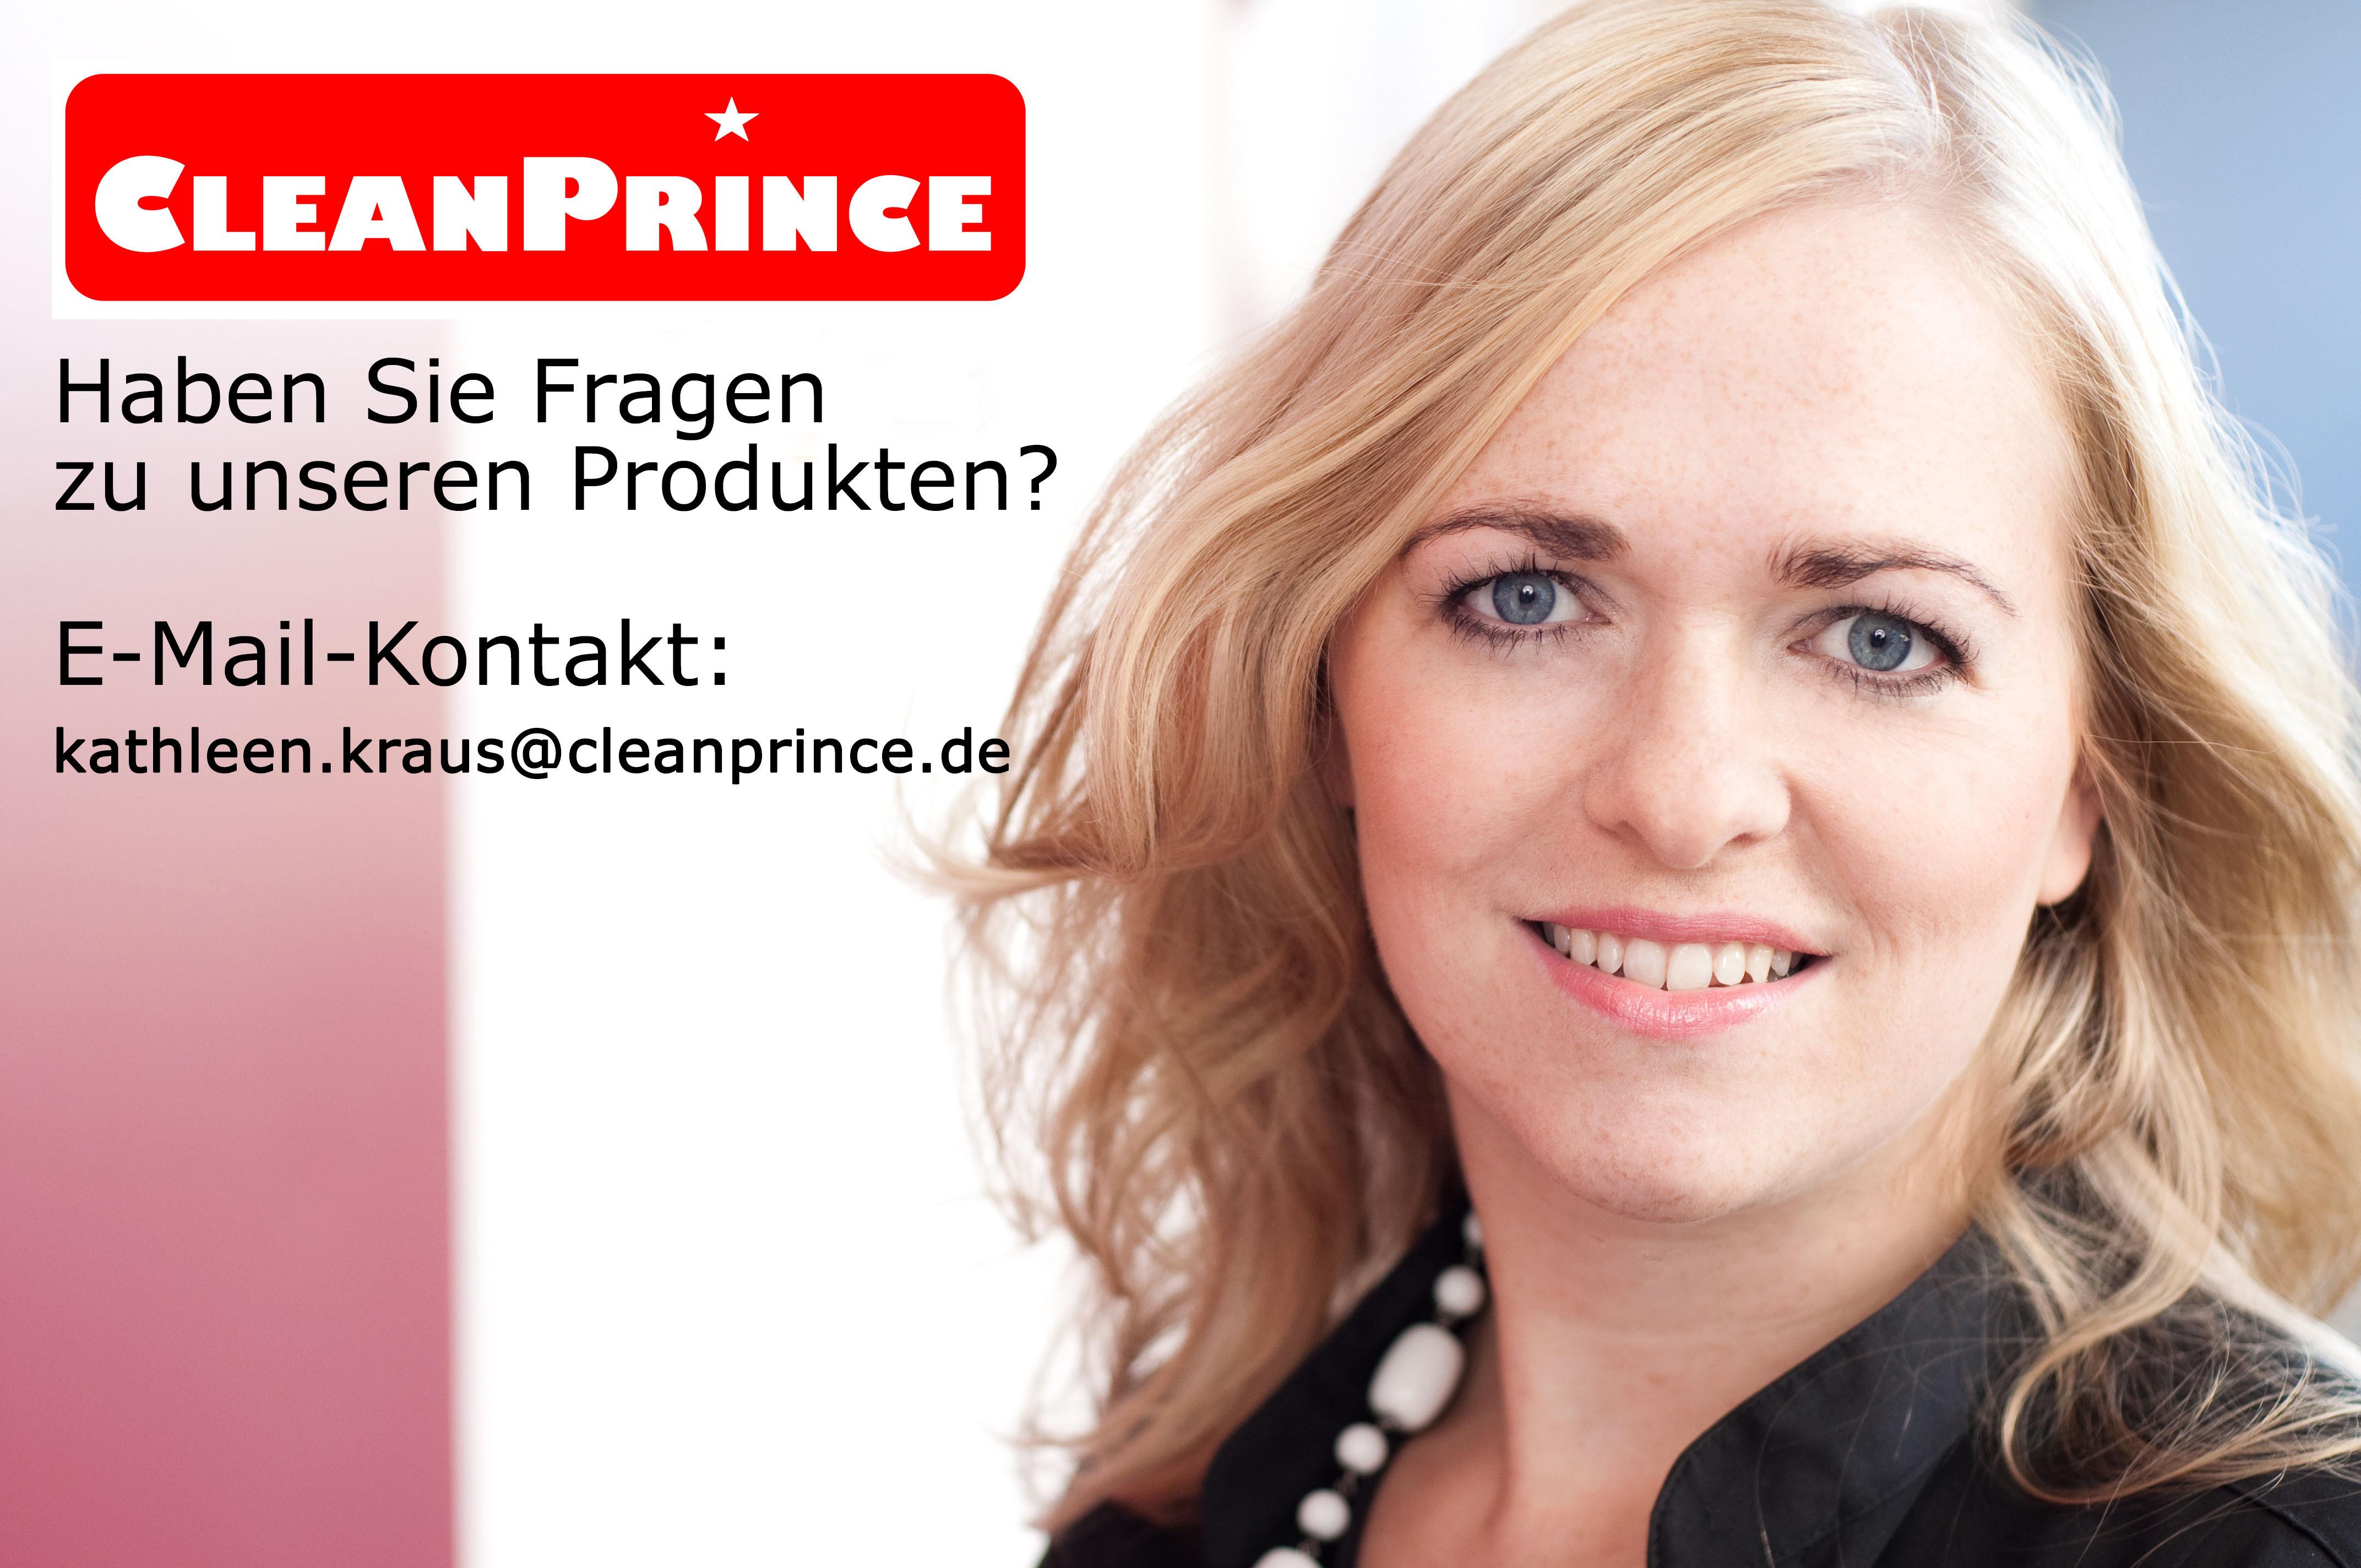 Kathleen Kraus - Kundenservice